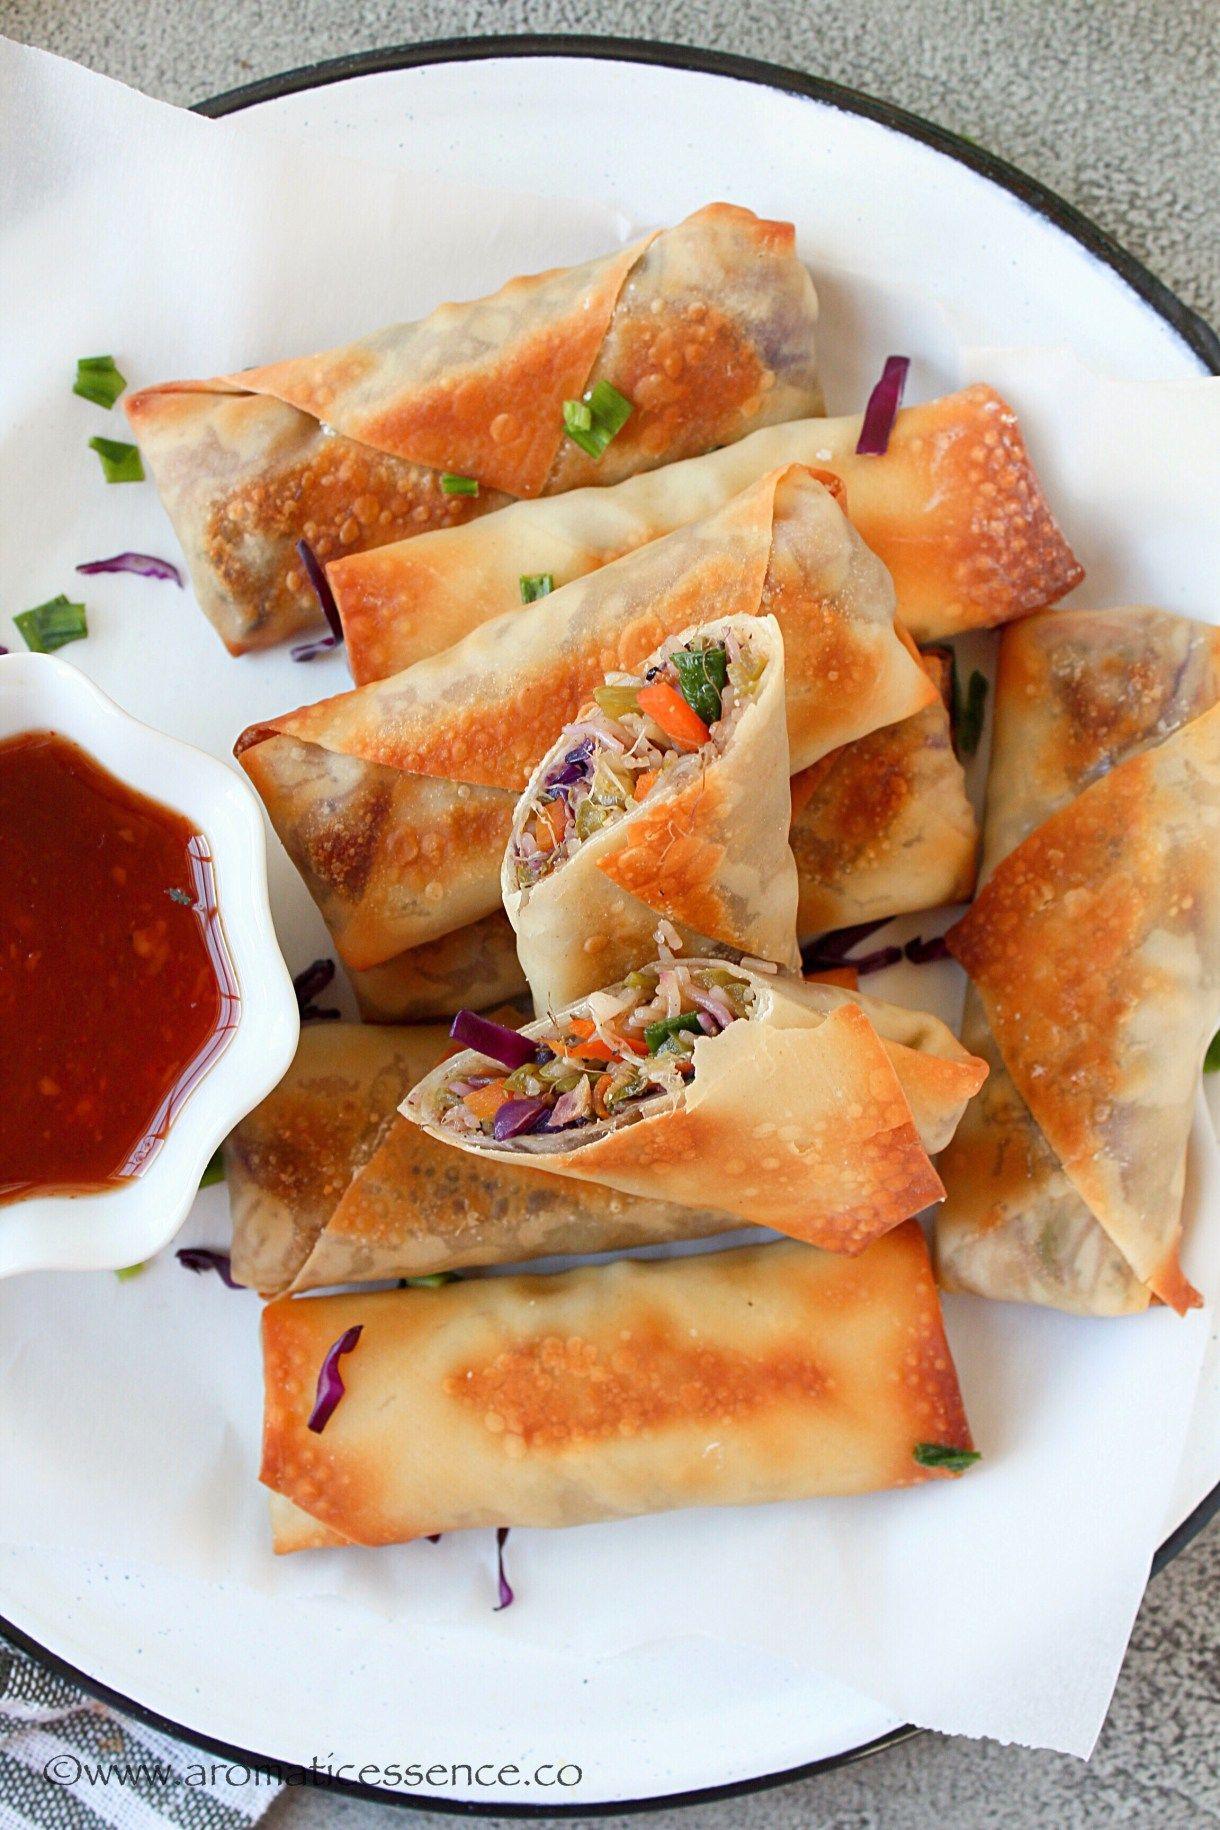 Veggie Spring Rolls Recipe (Baked) | Chinese Vegetable Spring Roll Recipe |  Recipe | Veggie spring rolls, Vegetable spring rolls, Spring roll recipe